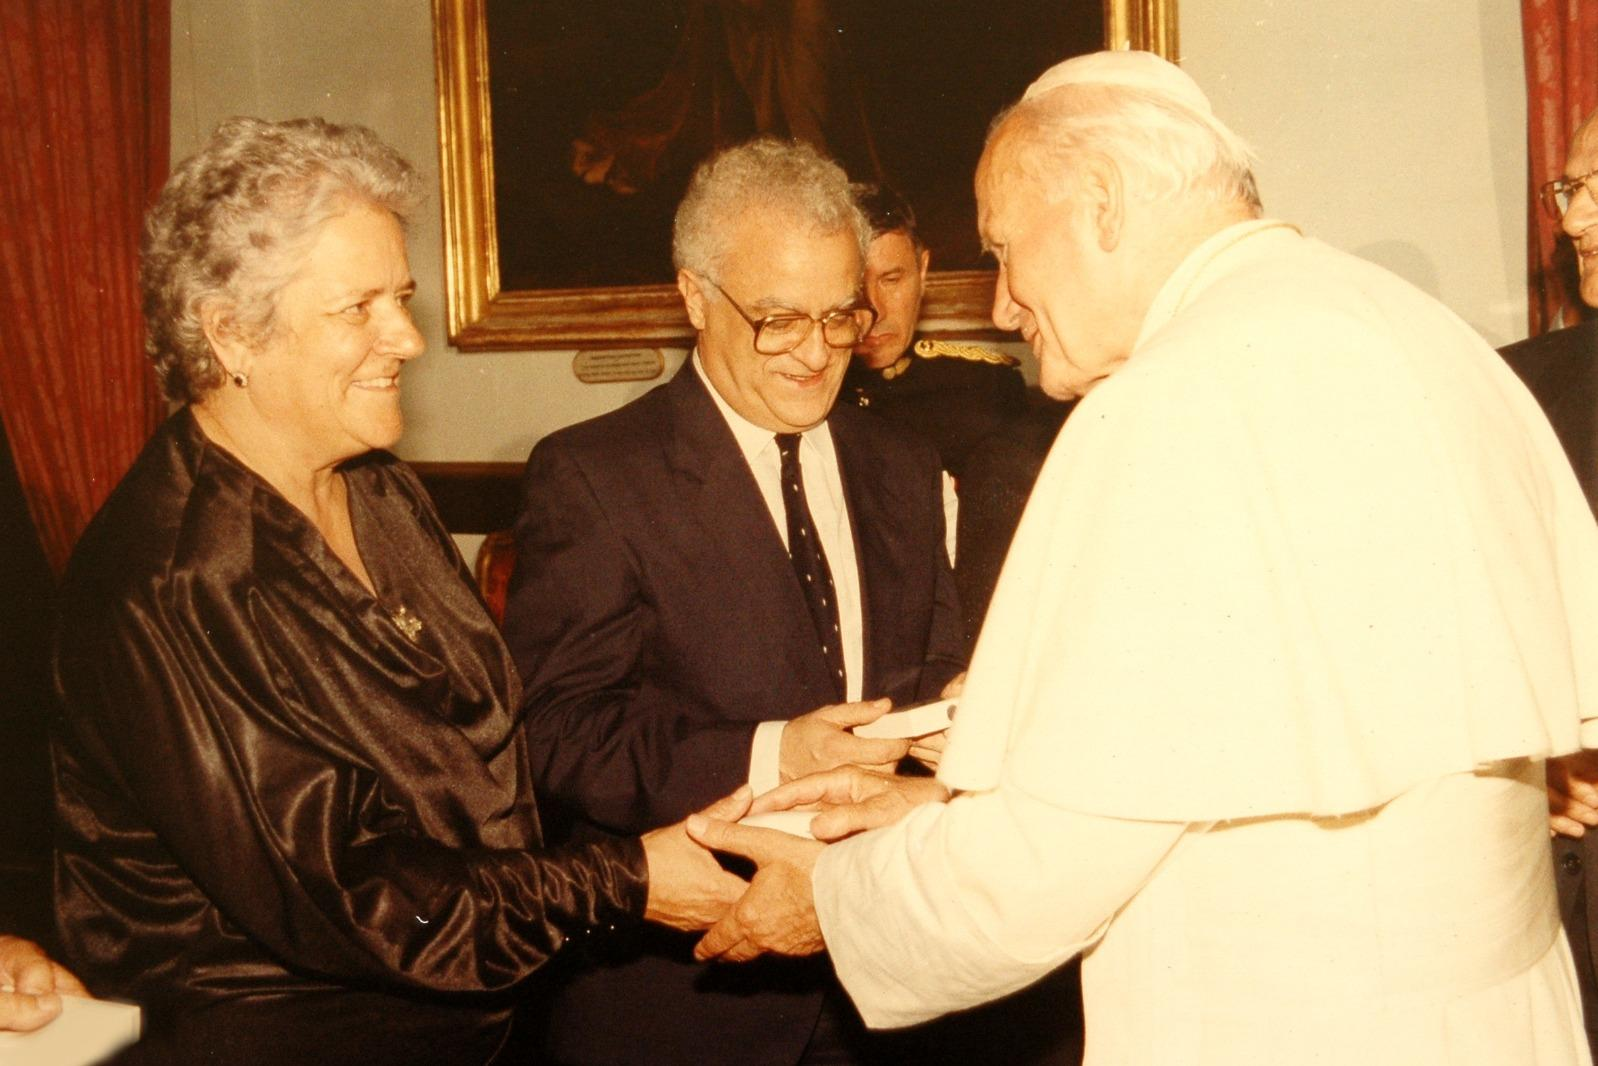 Pope John Paul II meets Eddie and Mary Fenech Adami in 1990.